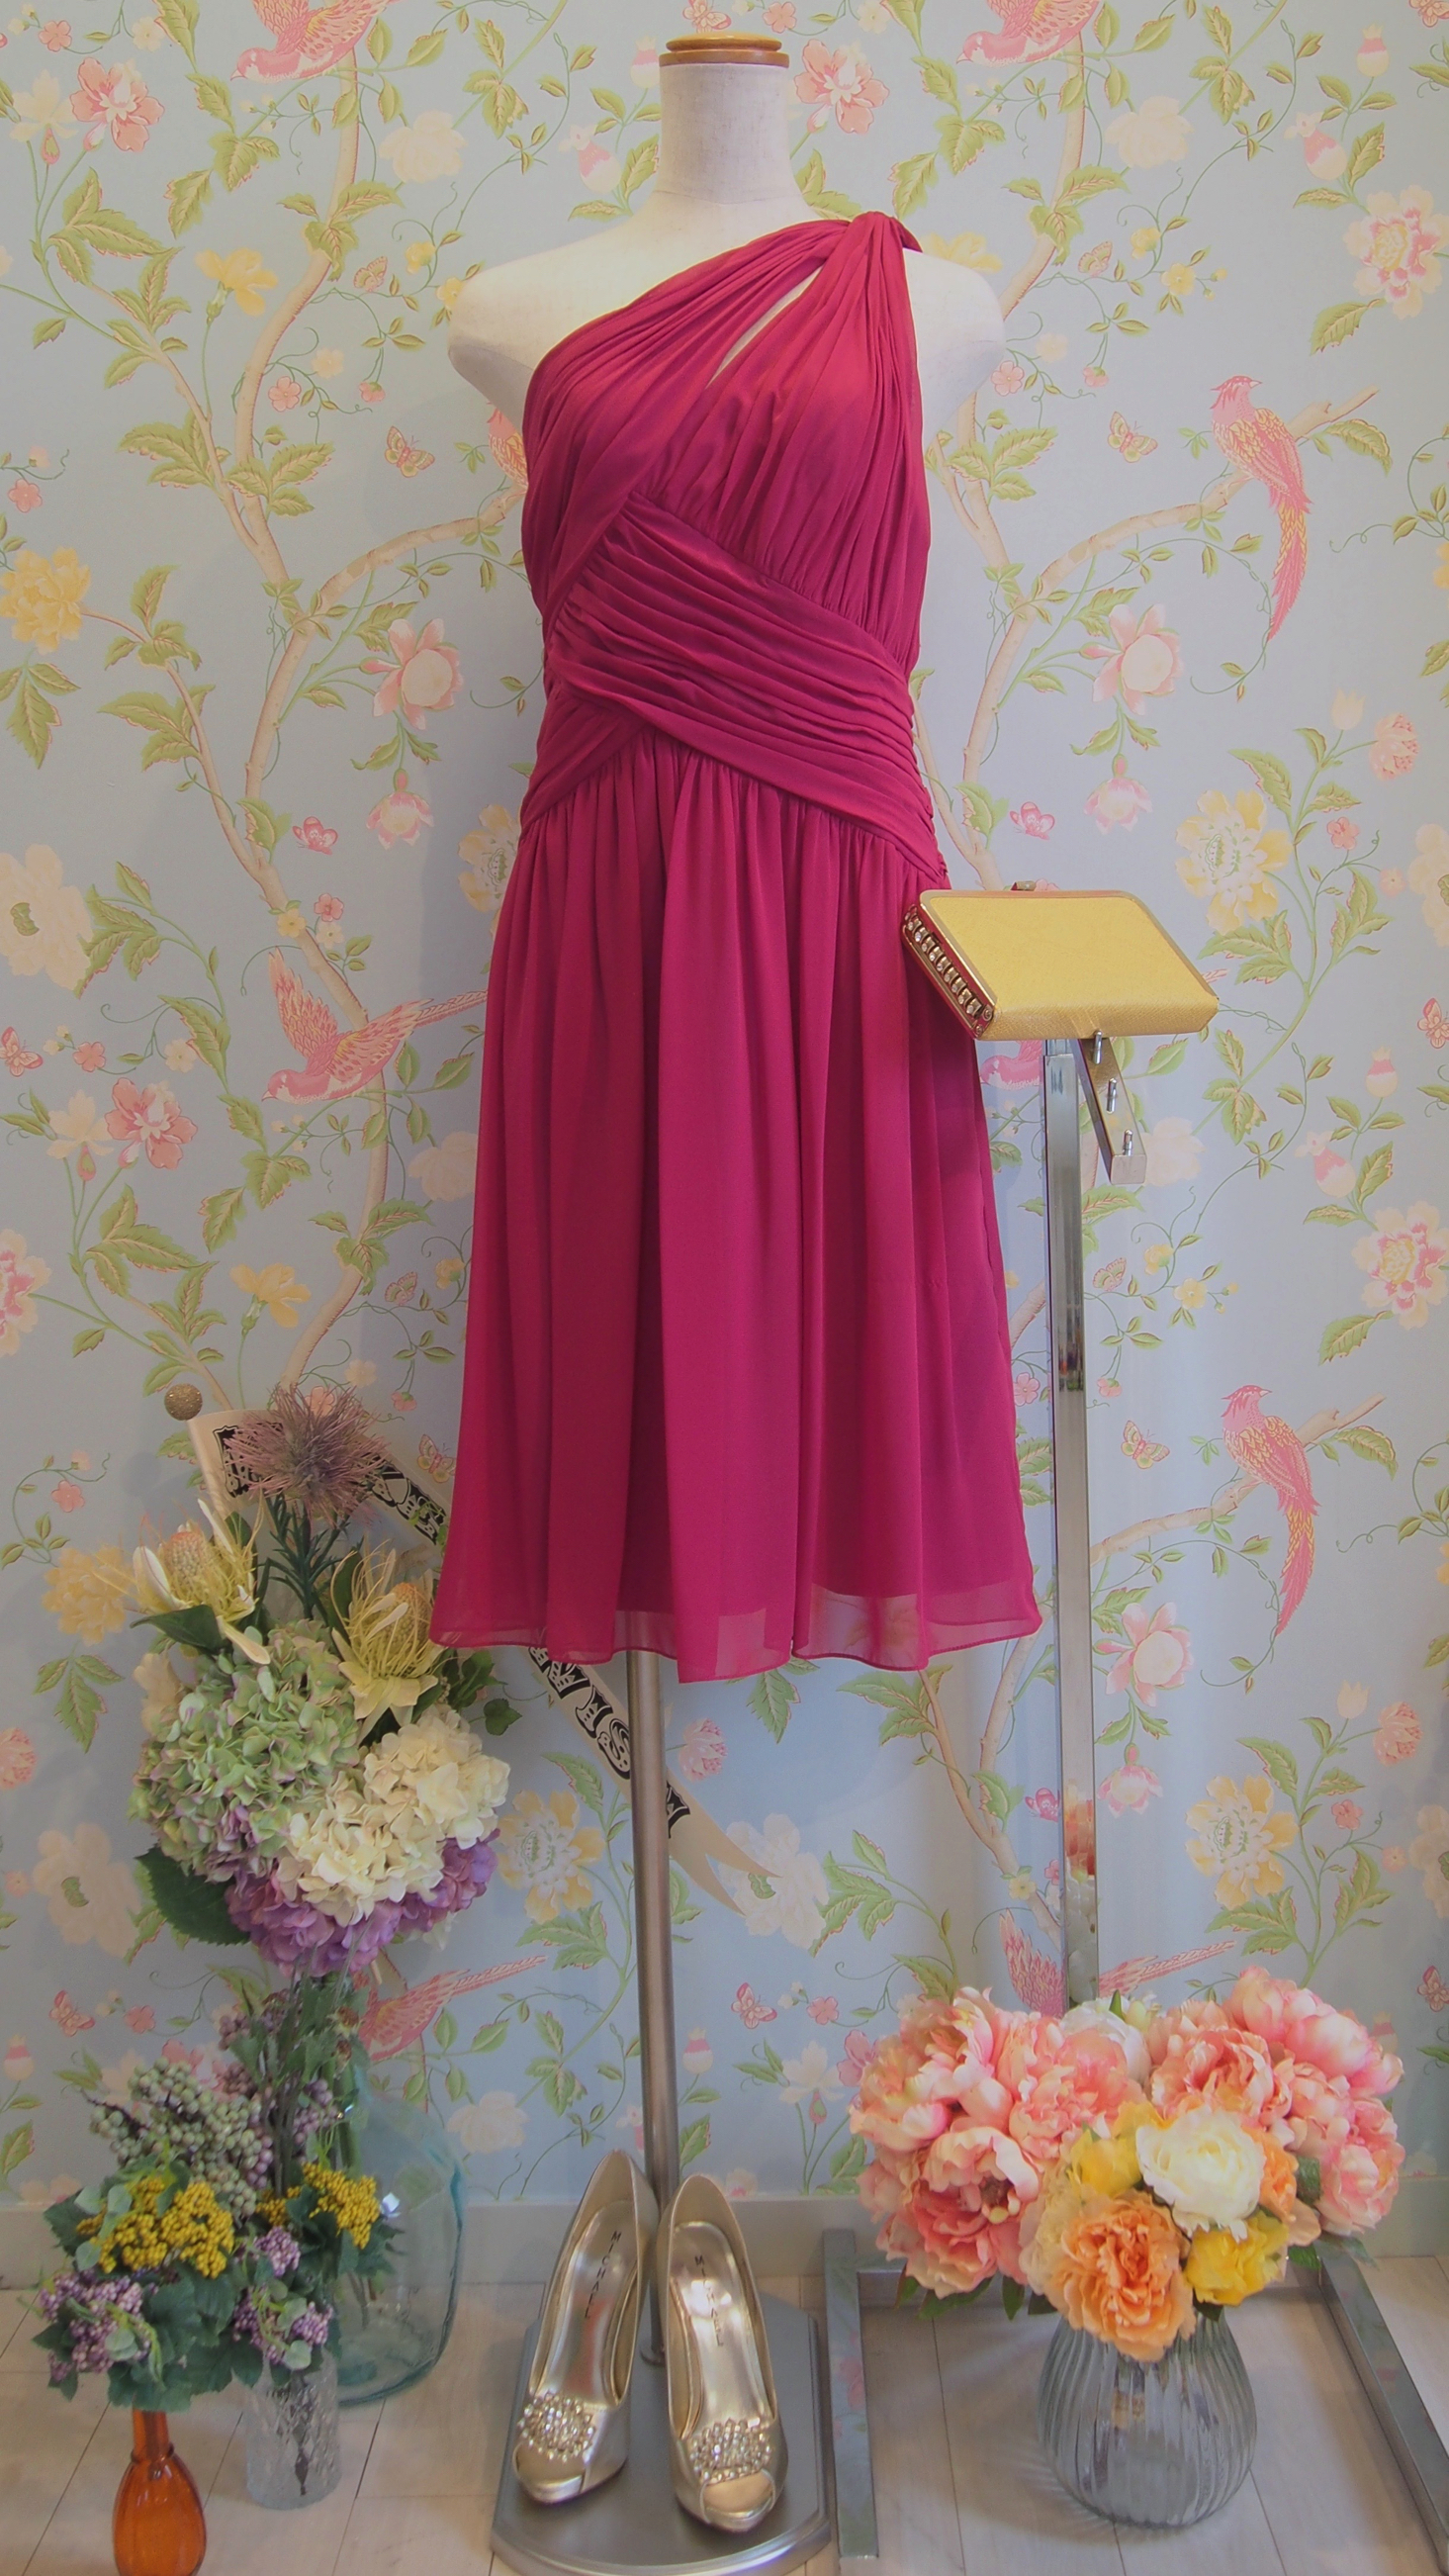 nr_dress_421